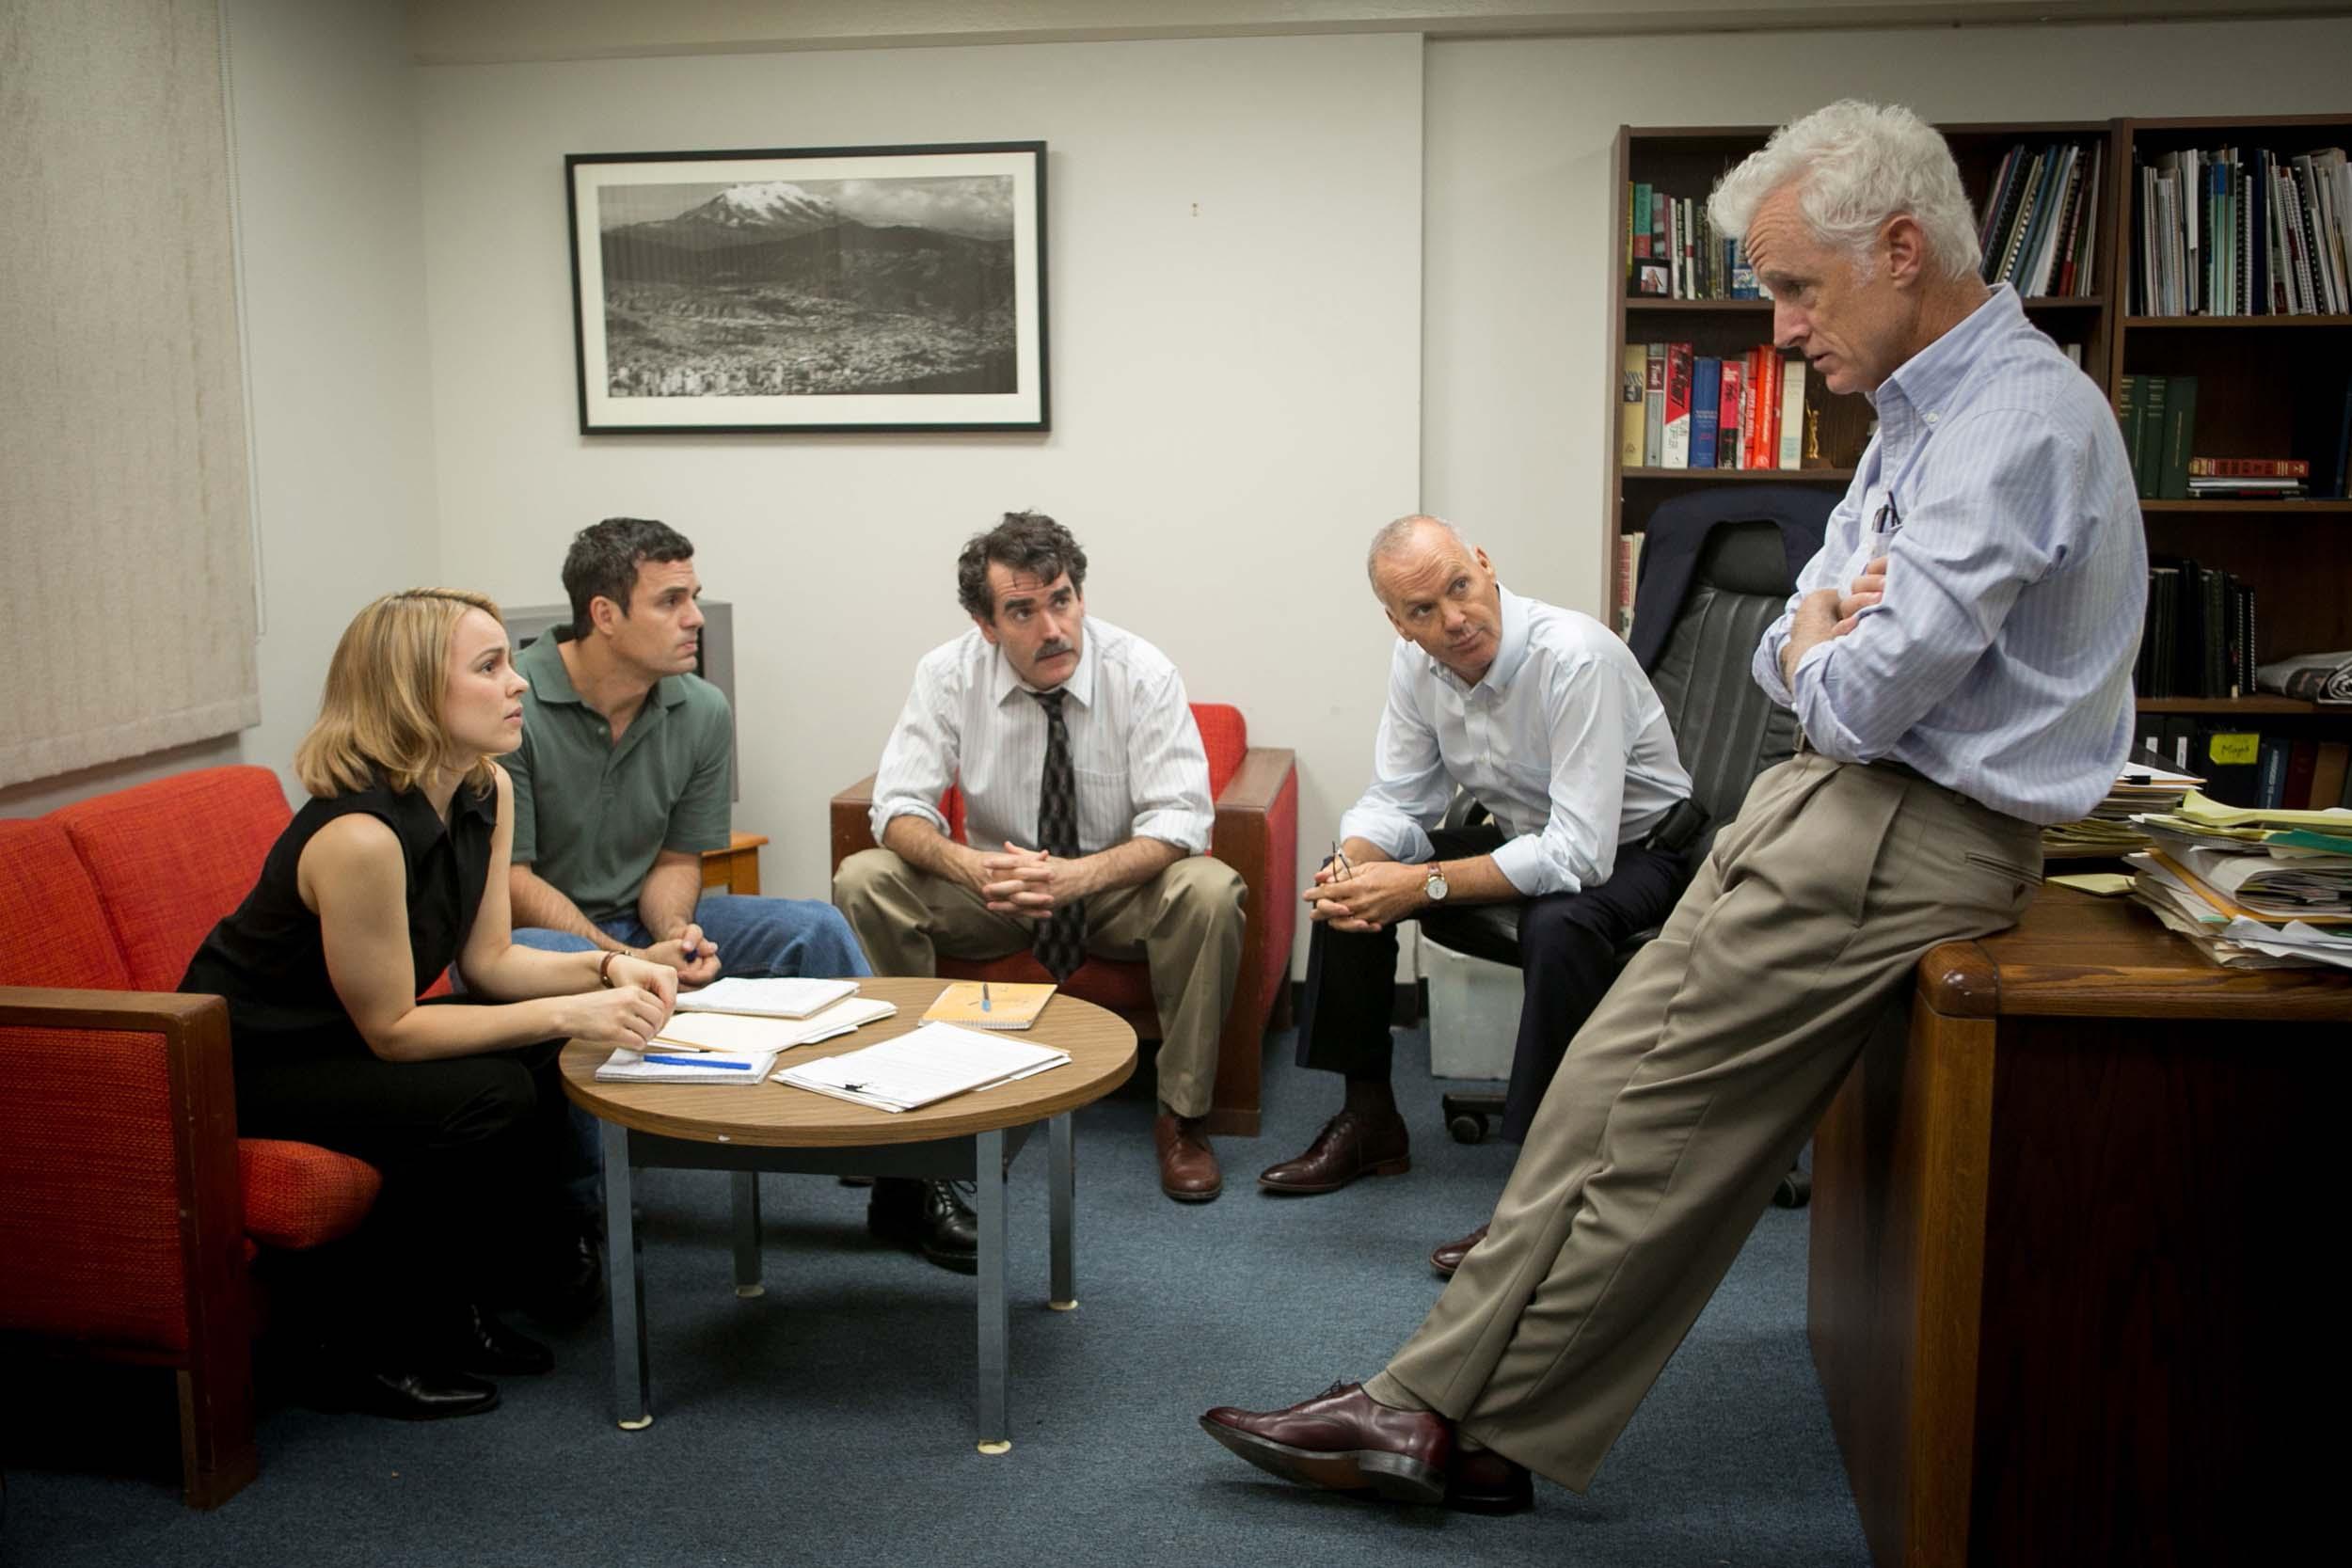 (l to r) Rachel McAdams, Mark Ruffalo, Brian D'Arcy James, Michael Keaton, John Slattery (courtesy of Open Road)